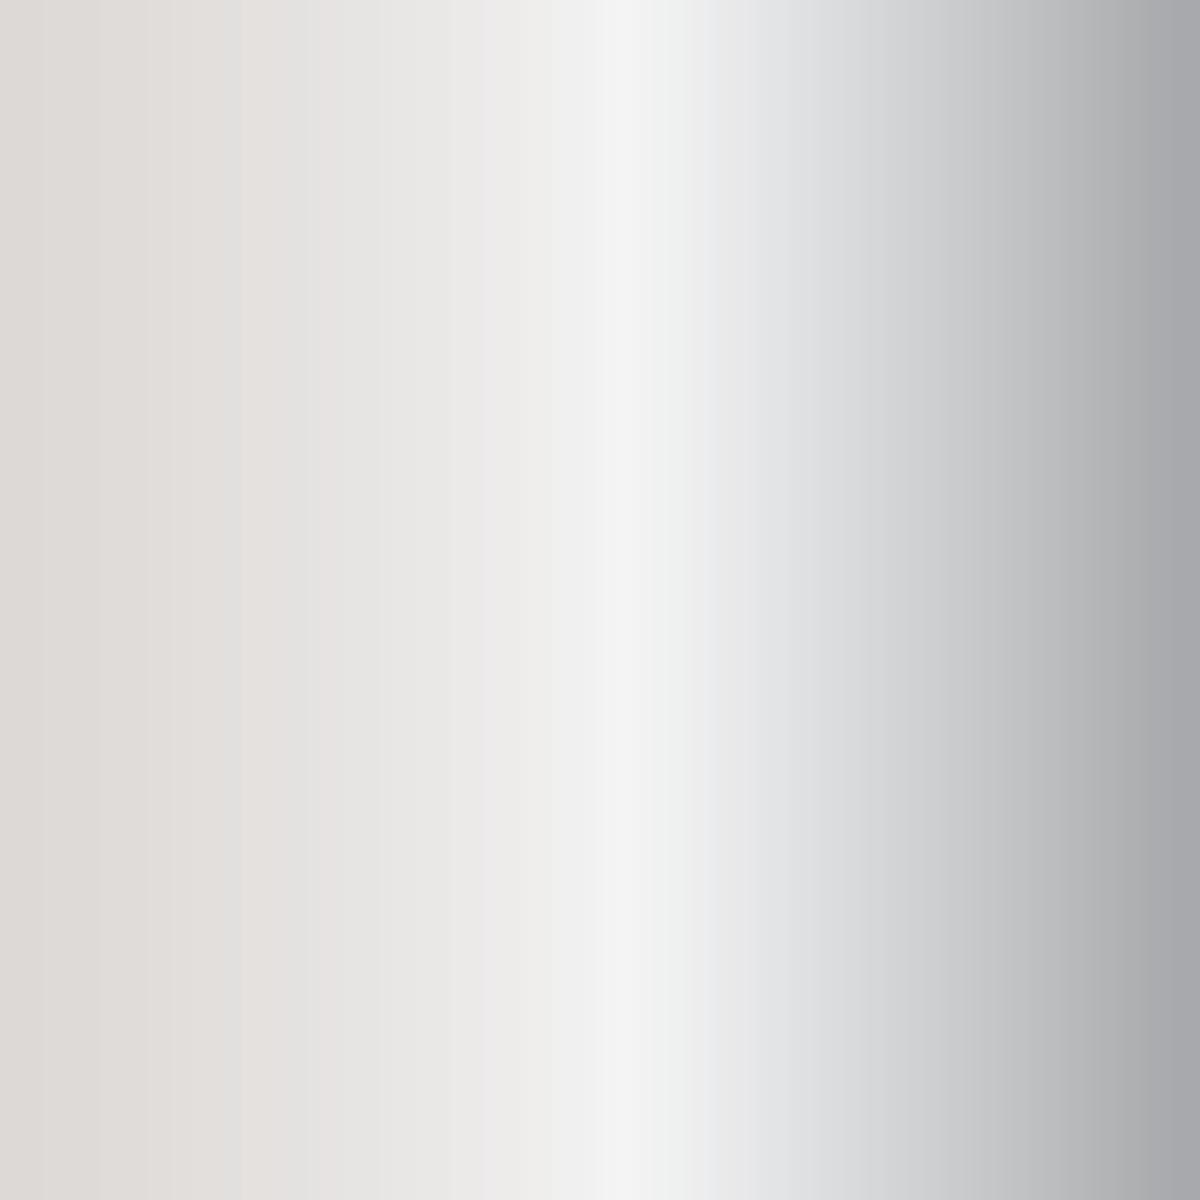 FolkArt ® Brushed Metal™ Acrylic Paint - Silver, 2 oz.